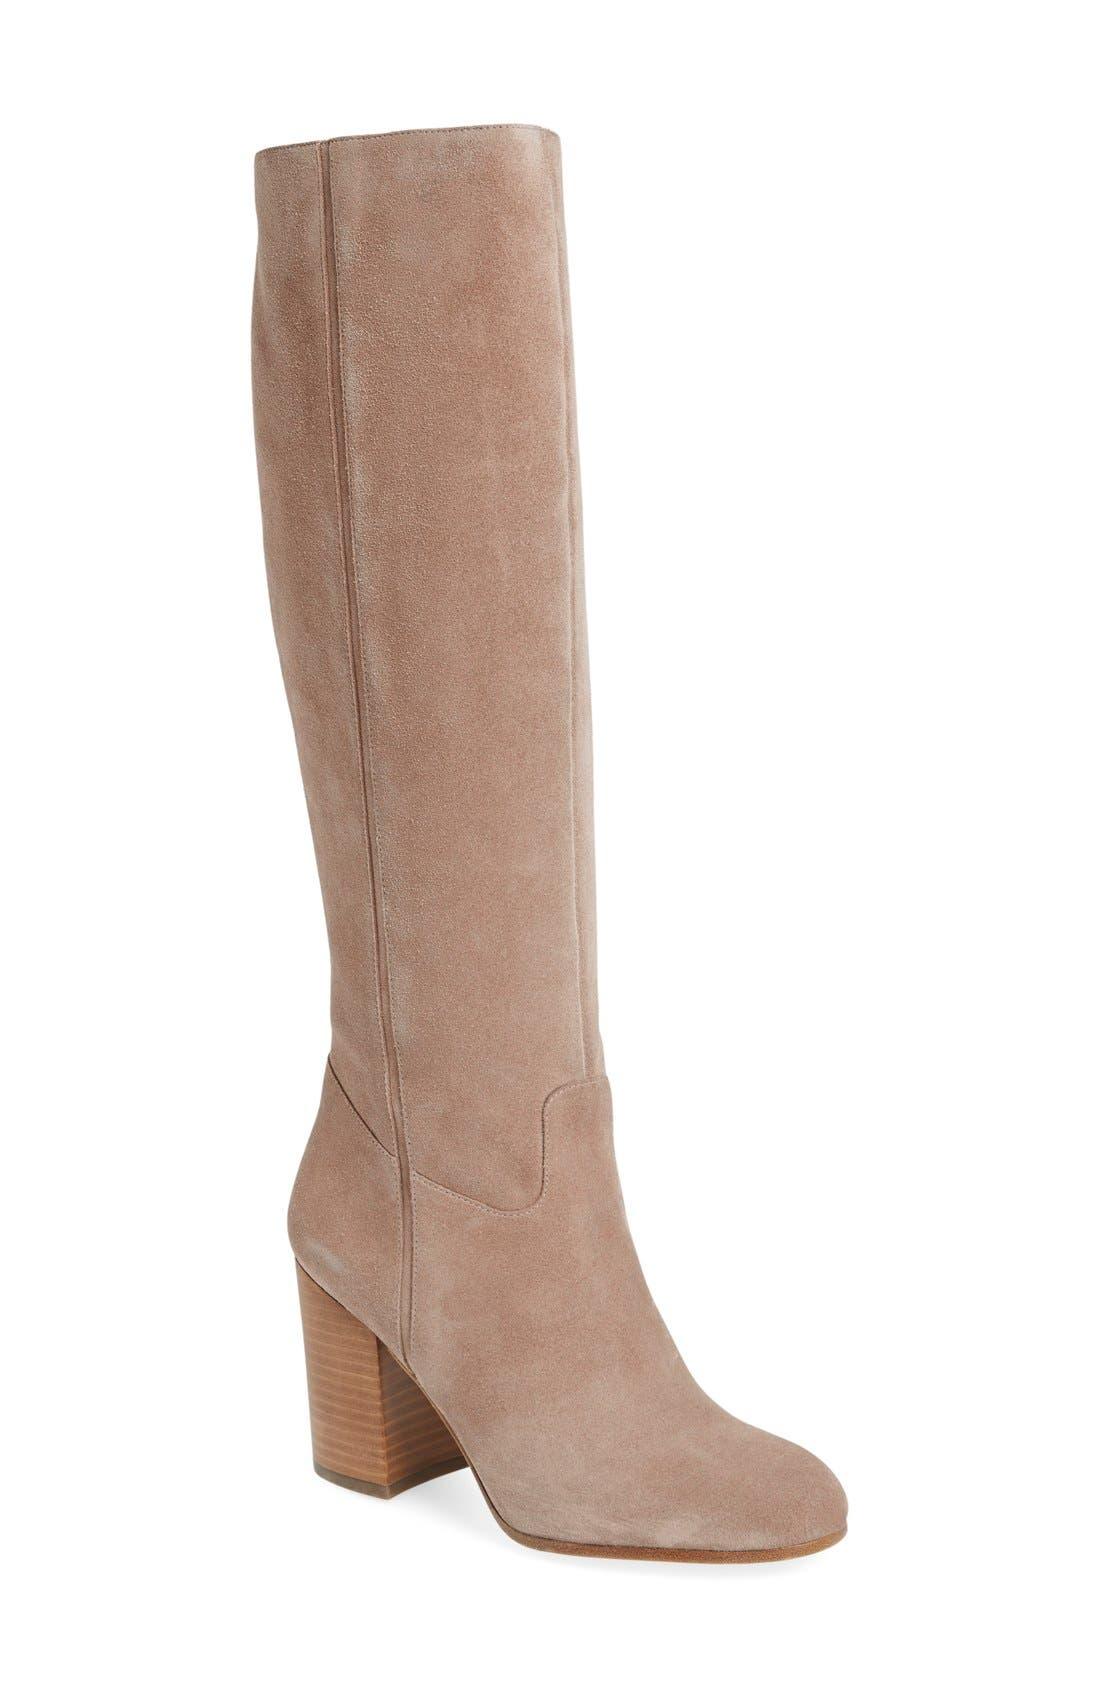 Alternate Image 1 Selected - Via Spiga 'Beckett' Tall Boot (Women)